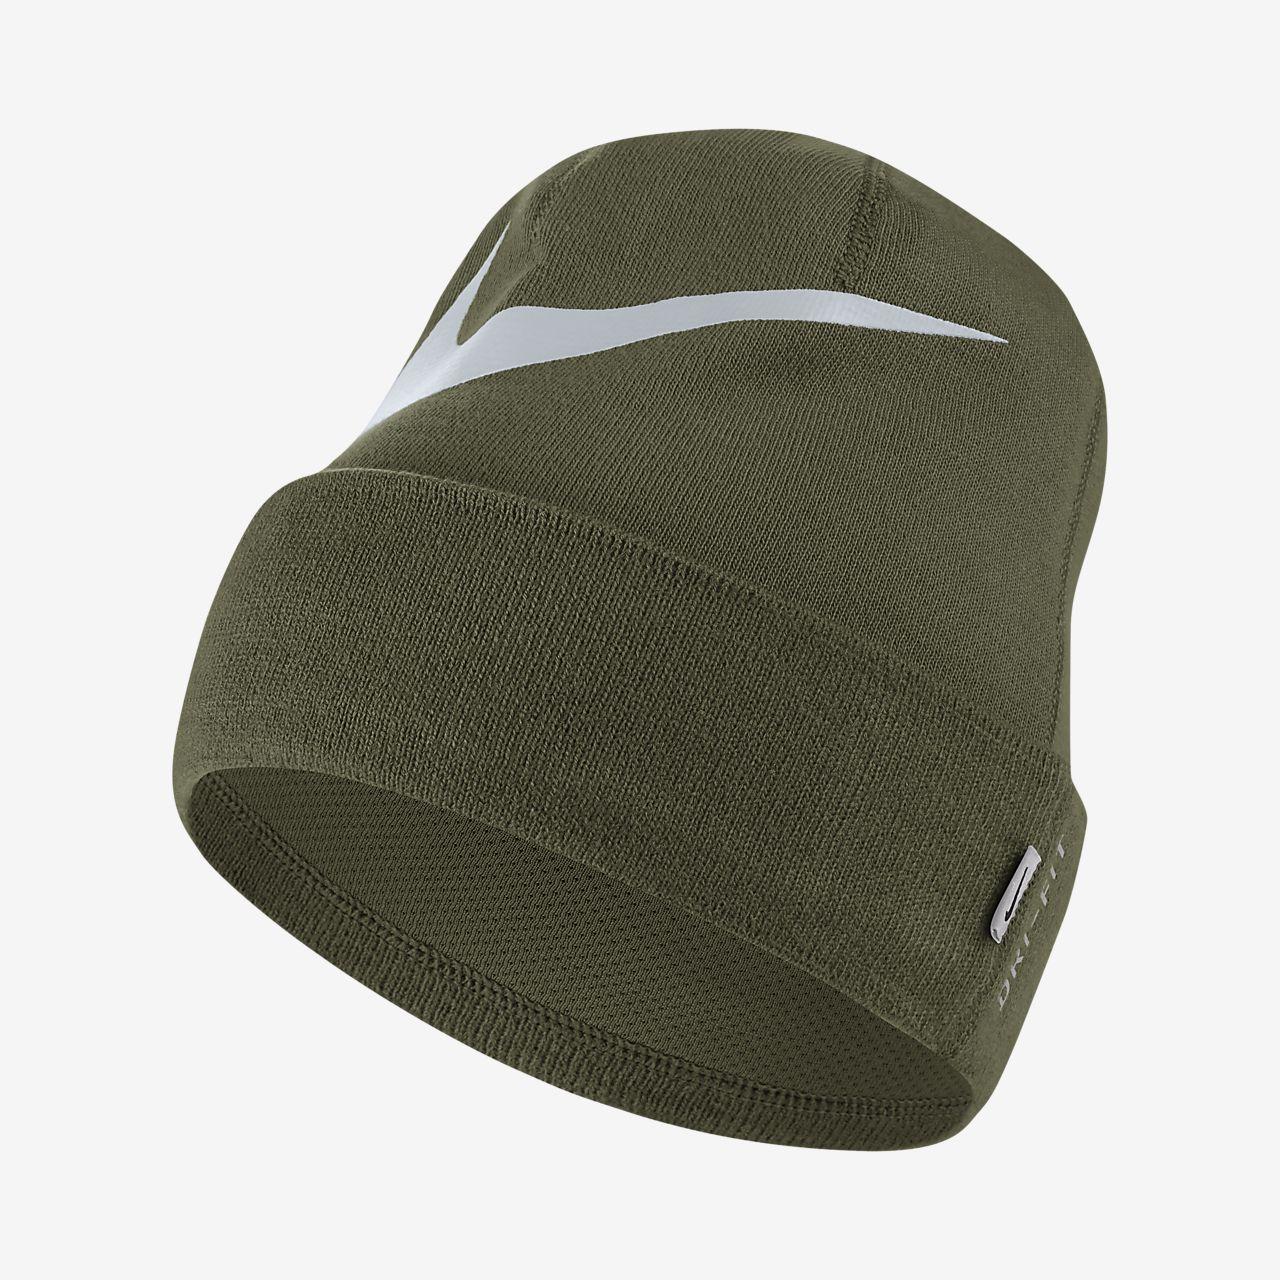 57aa9fe410c98 Nike Swoosh Cuffed Training Knit Hat. Nike.com GB